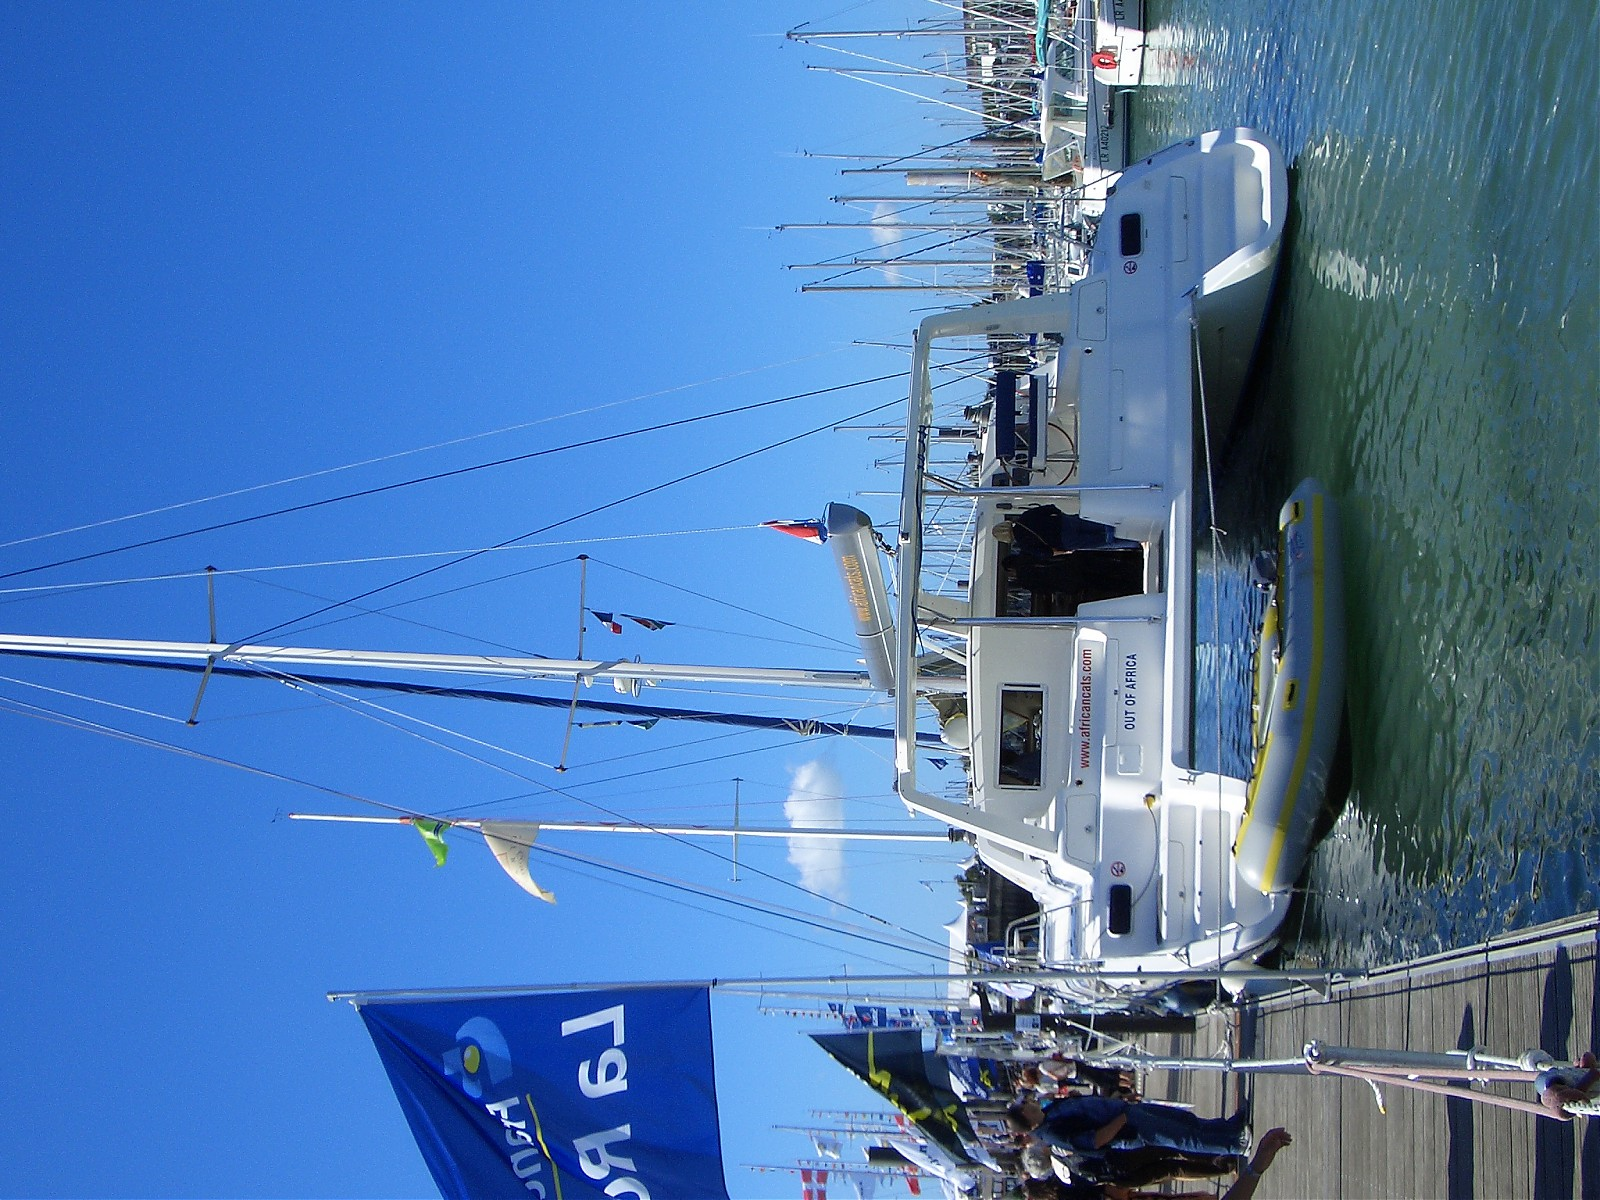 Click image for larger version  Name:La Rochelle - IJmuiden 2 056.jpg Views:99 Size:518.8 KB ID:4671